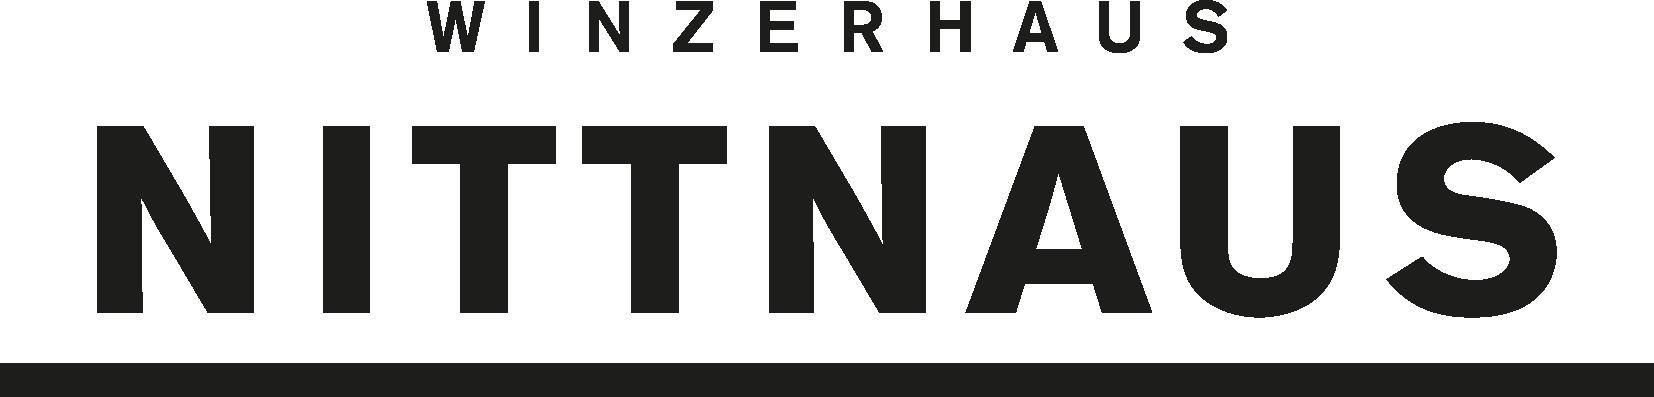 Winzerhaus Nittnaus Gols – Michael & Andreas